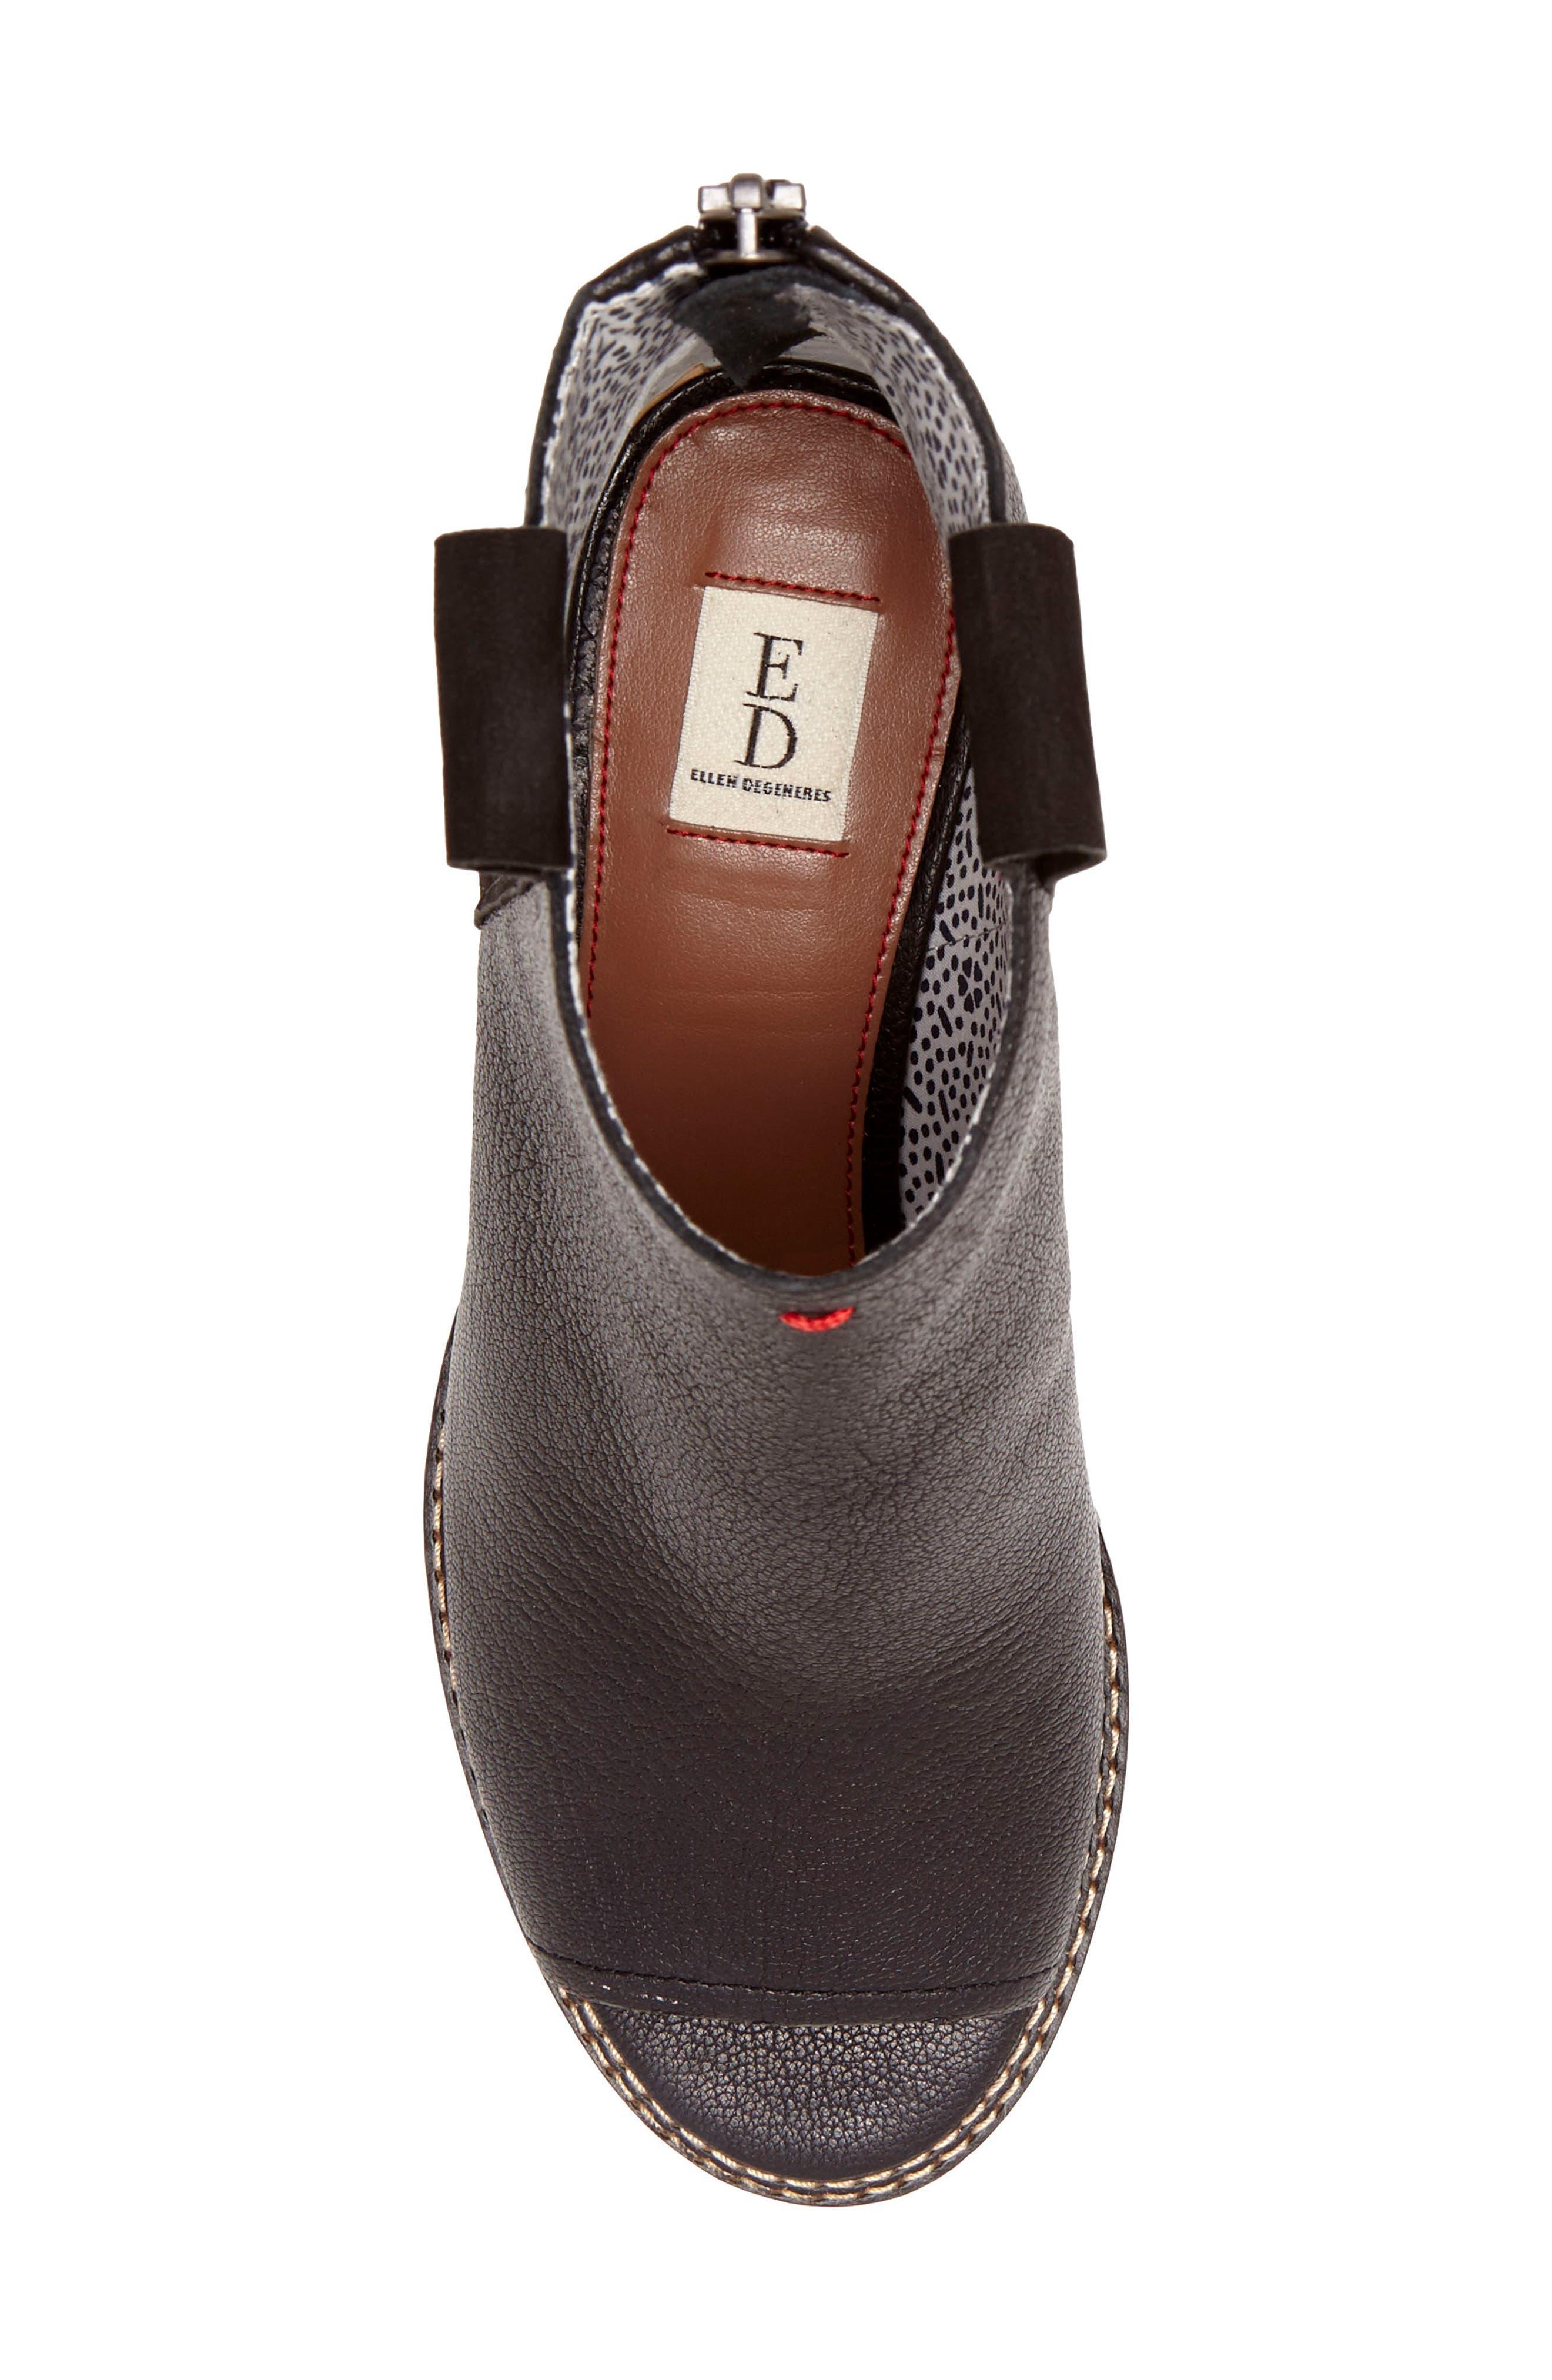 Taromi Peep Toe Bootie,                             Alternate thumbnail 5, color,                             Black Leather